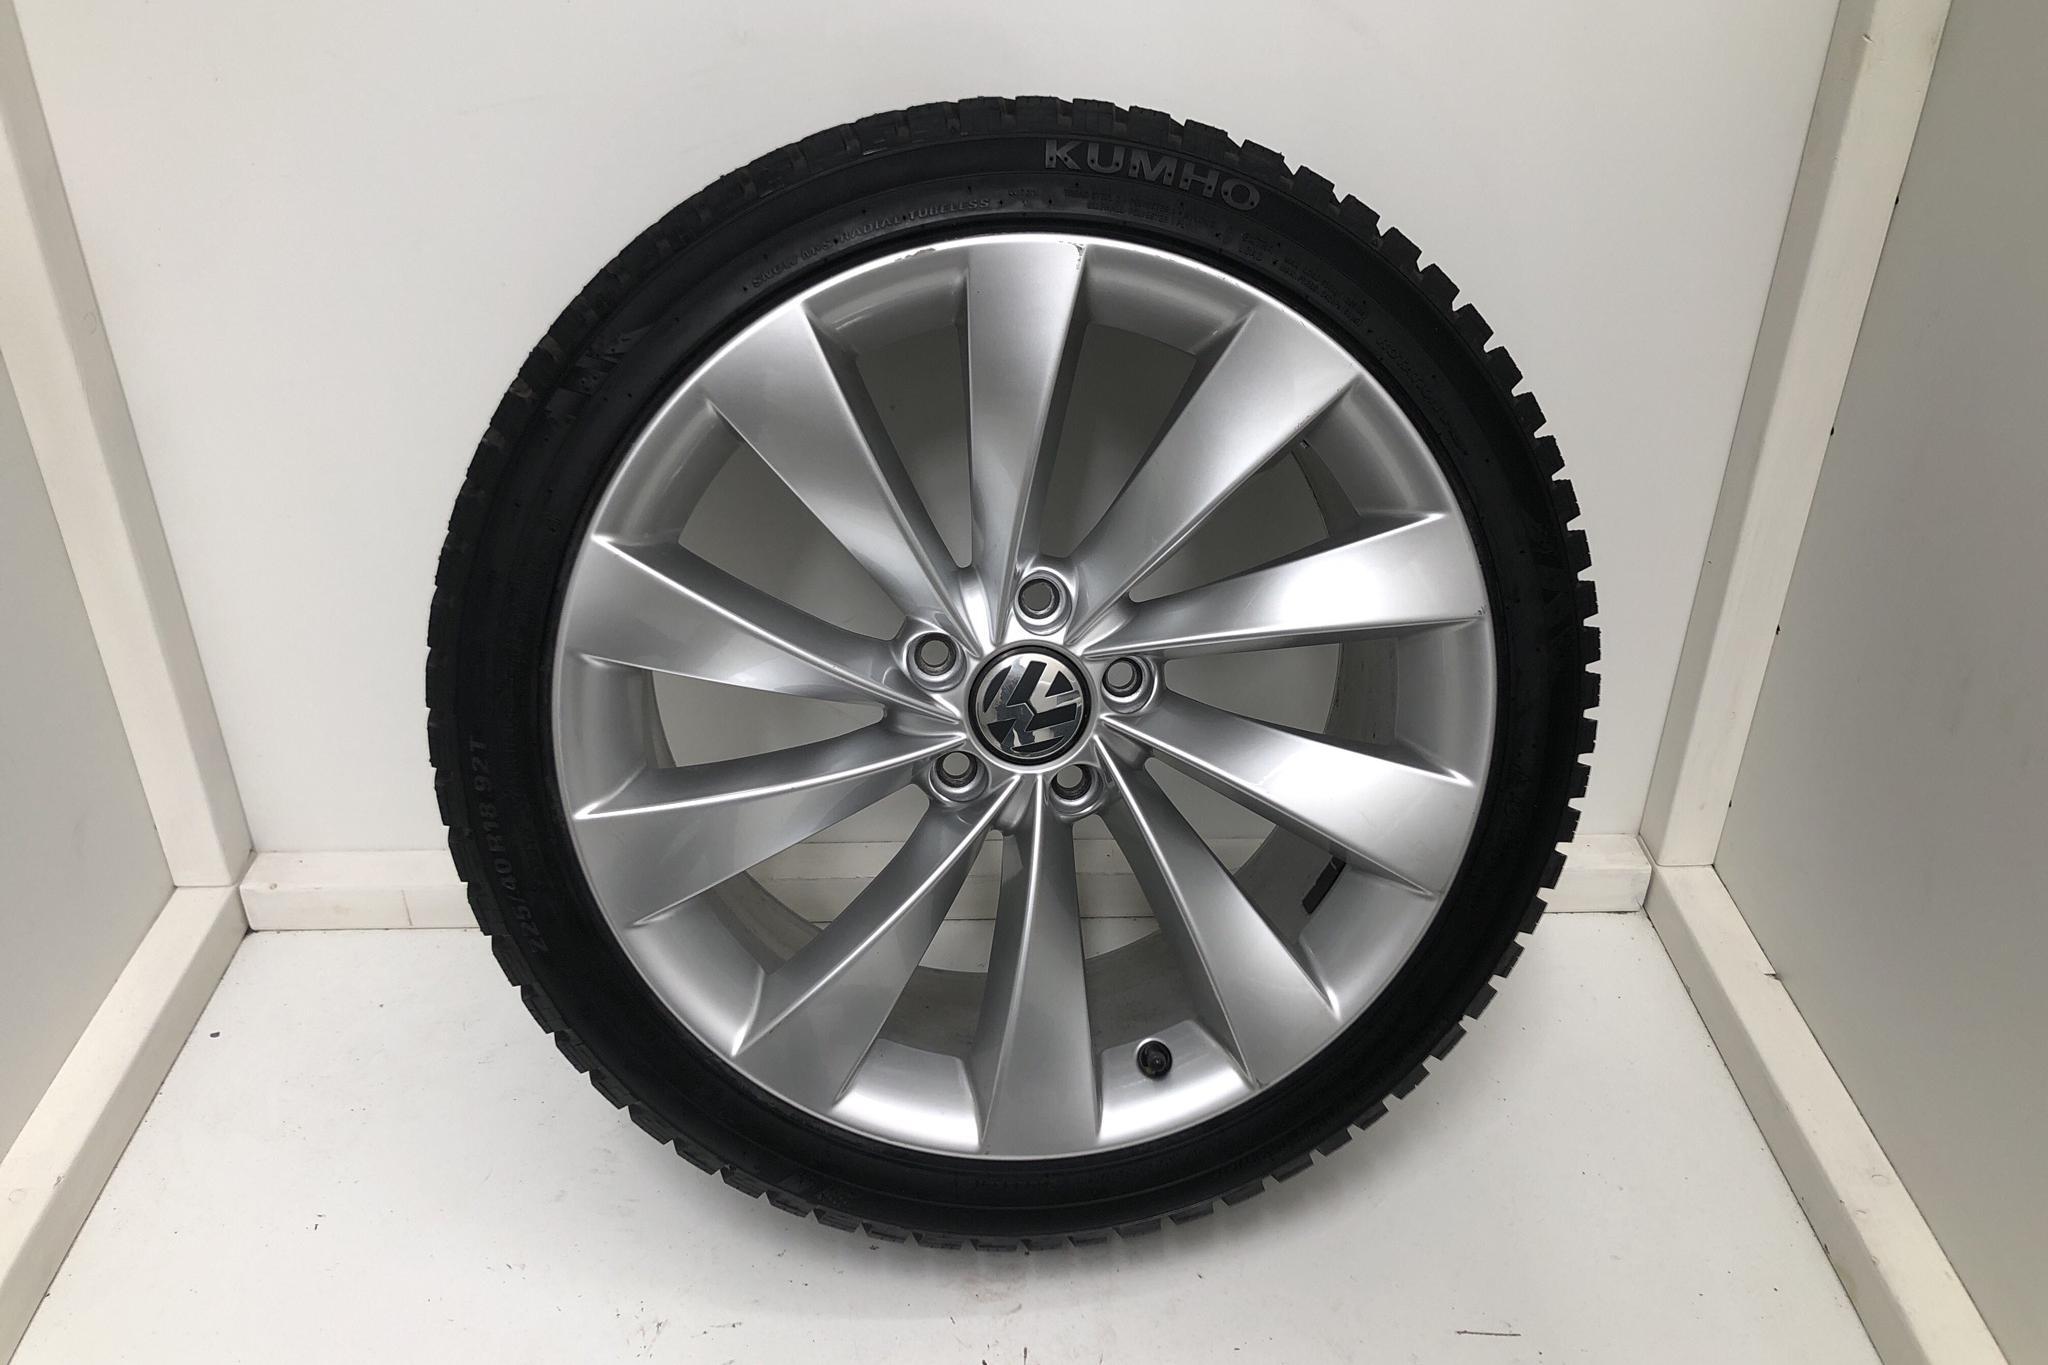 VW Scirocco 1.4 TSI (180hk) - 5 600 mil - Manuell - vit - 2015